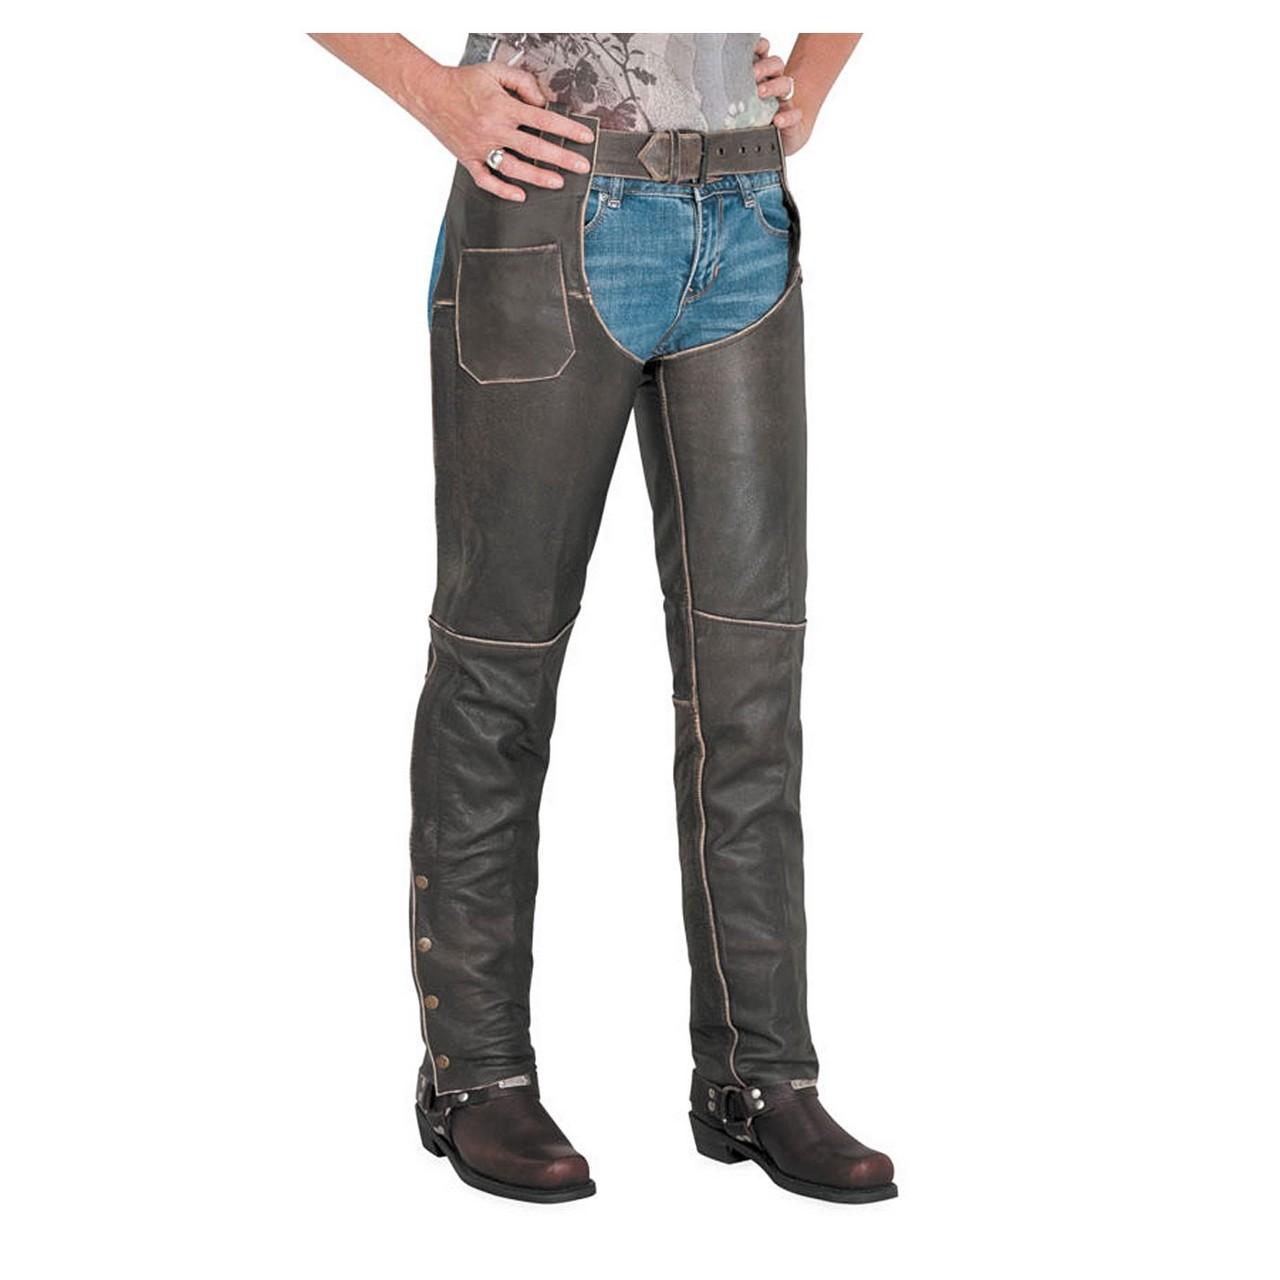 【RIVER ROAD】DRIFTER Chap 西部牛仔護褲